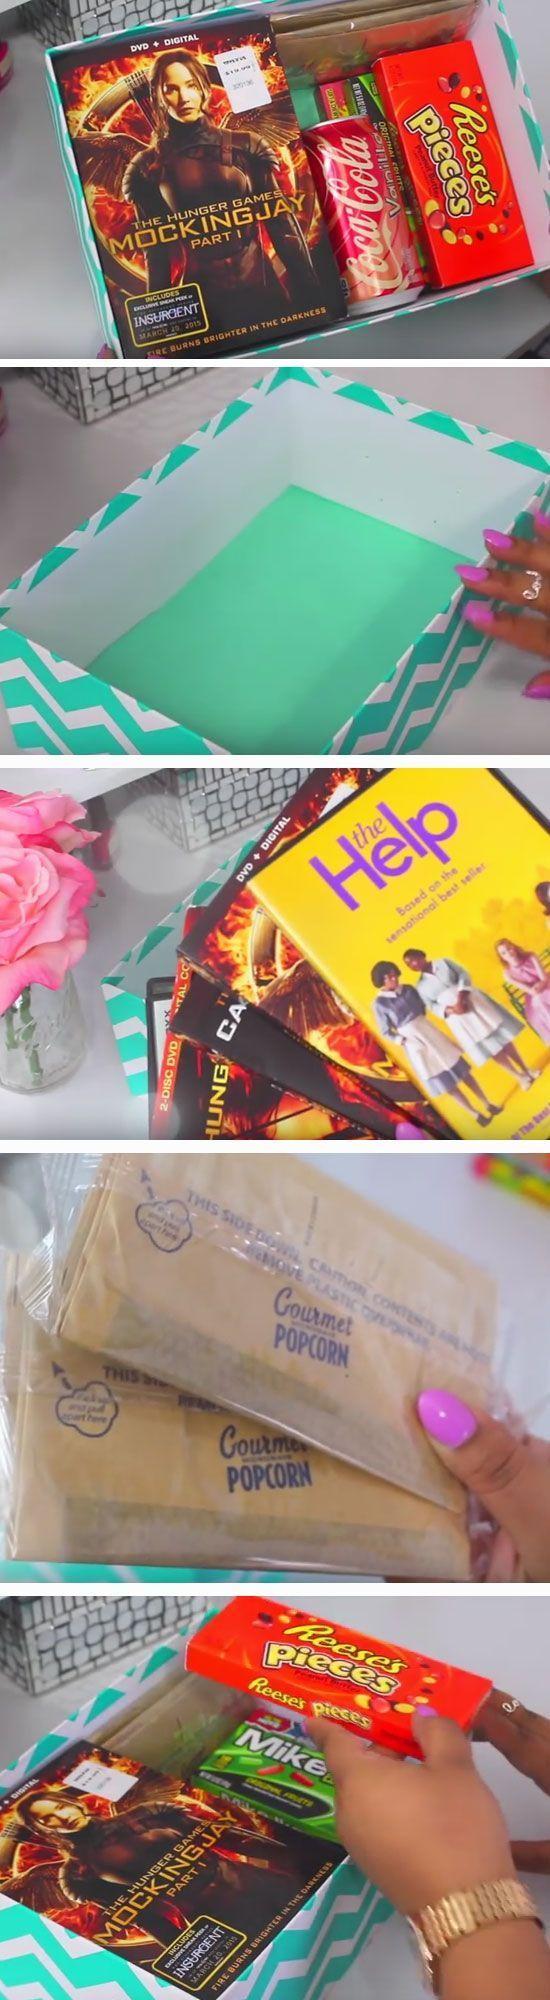 25+ best ideas about Christmas Baskets on Pinterest | Teen gift ...